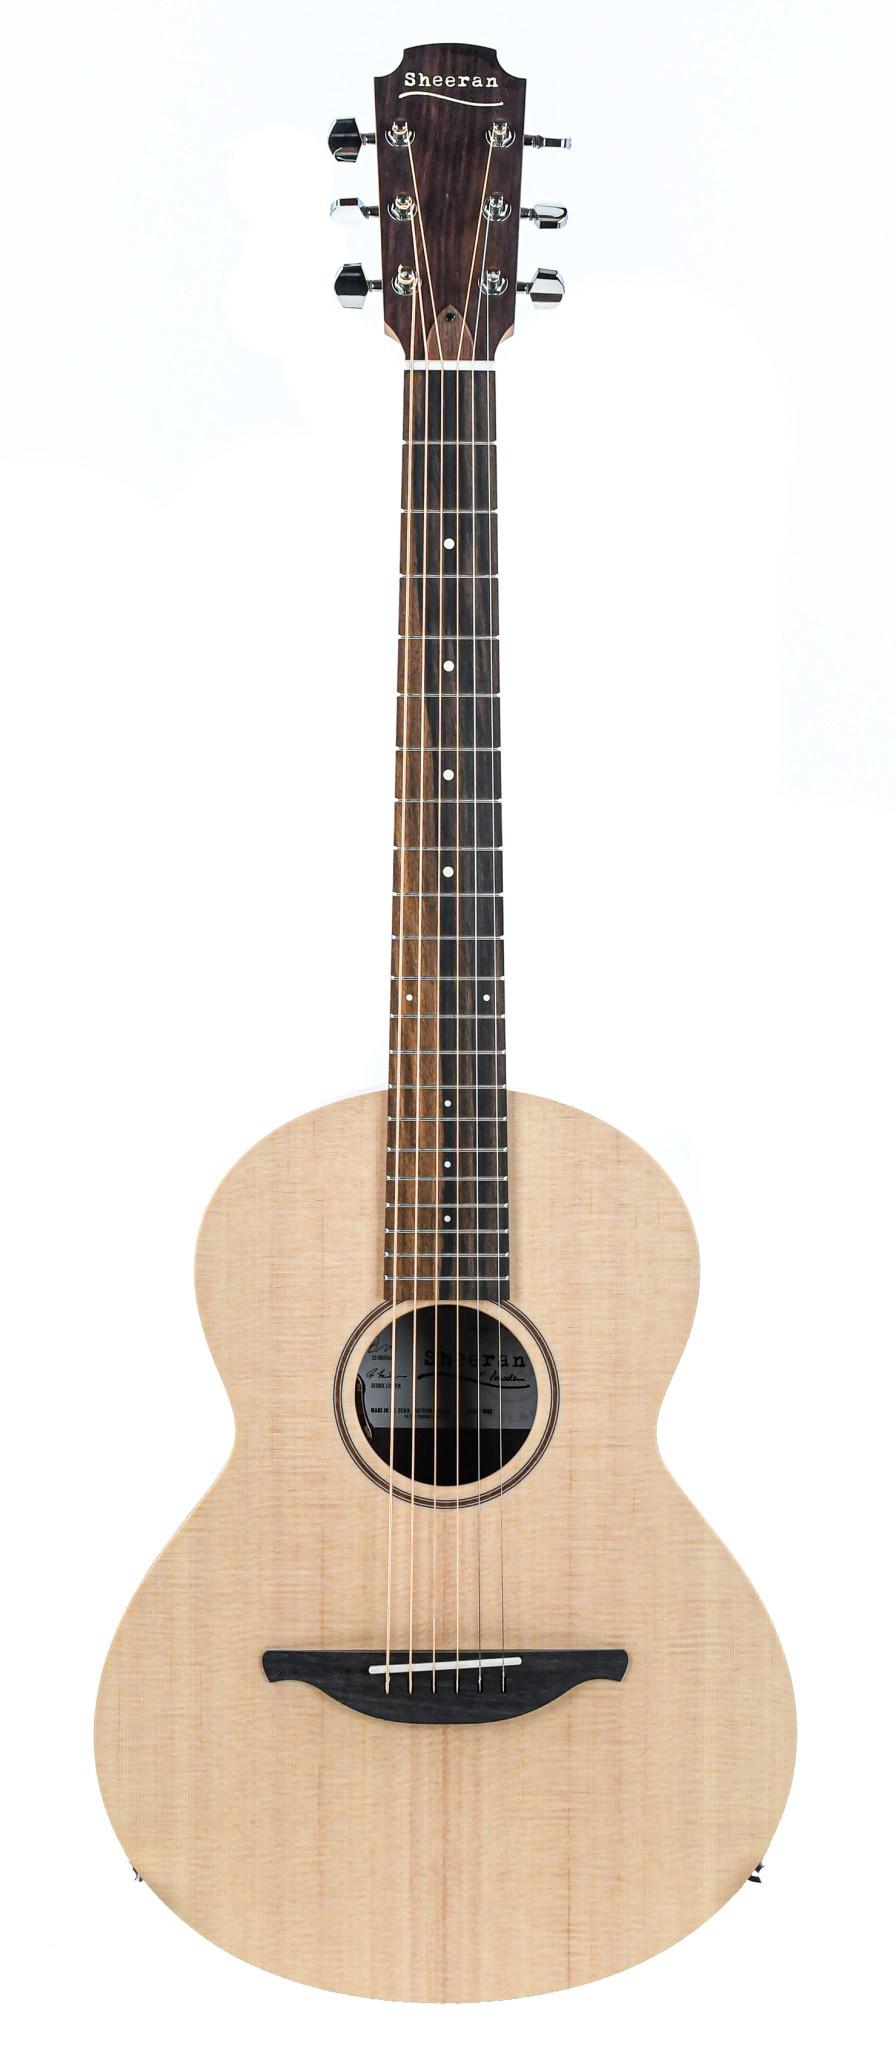 Sheeran W02 Rosewood Sitka Spruce